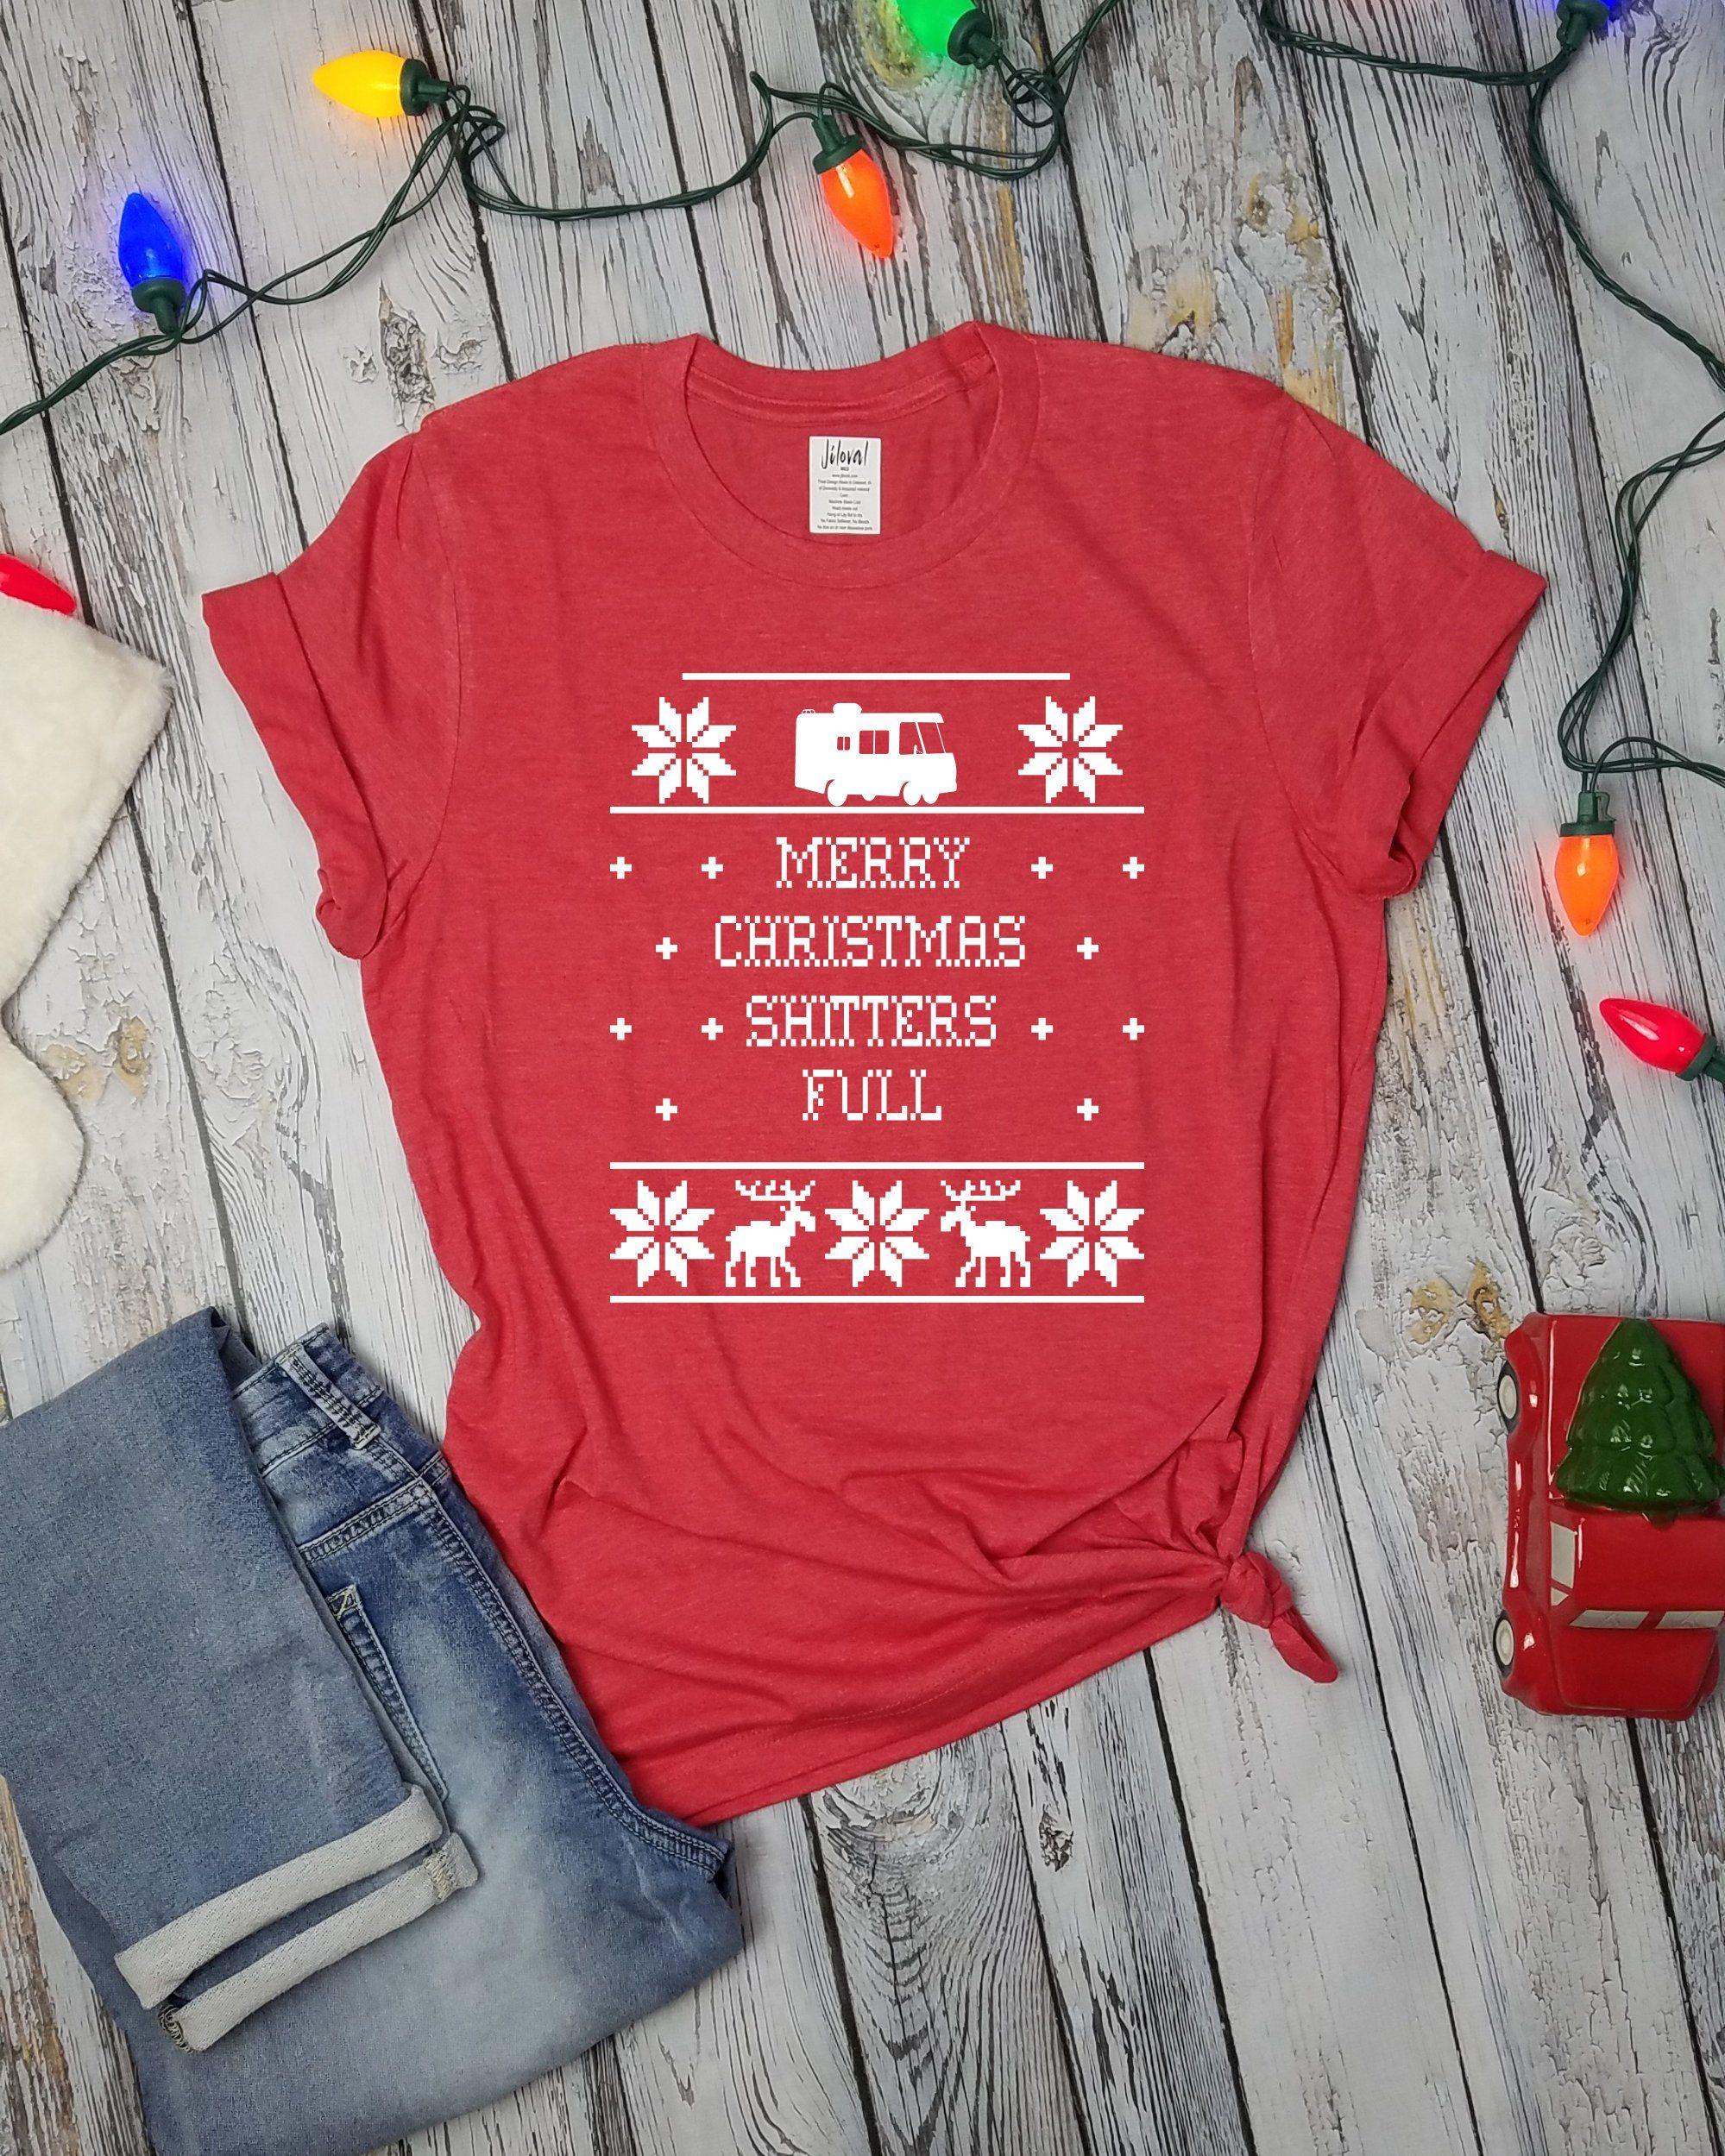 8a79d6988 Shitters Full Shirt, Christmas Vacation Shirt, Unisex Holiday Shirt, Ugly  Sweater Shirt, Funny Holiday shirt, Cousin Eddy Shirt, Funny Shirt by  JilovalBrand ...